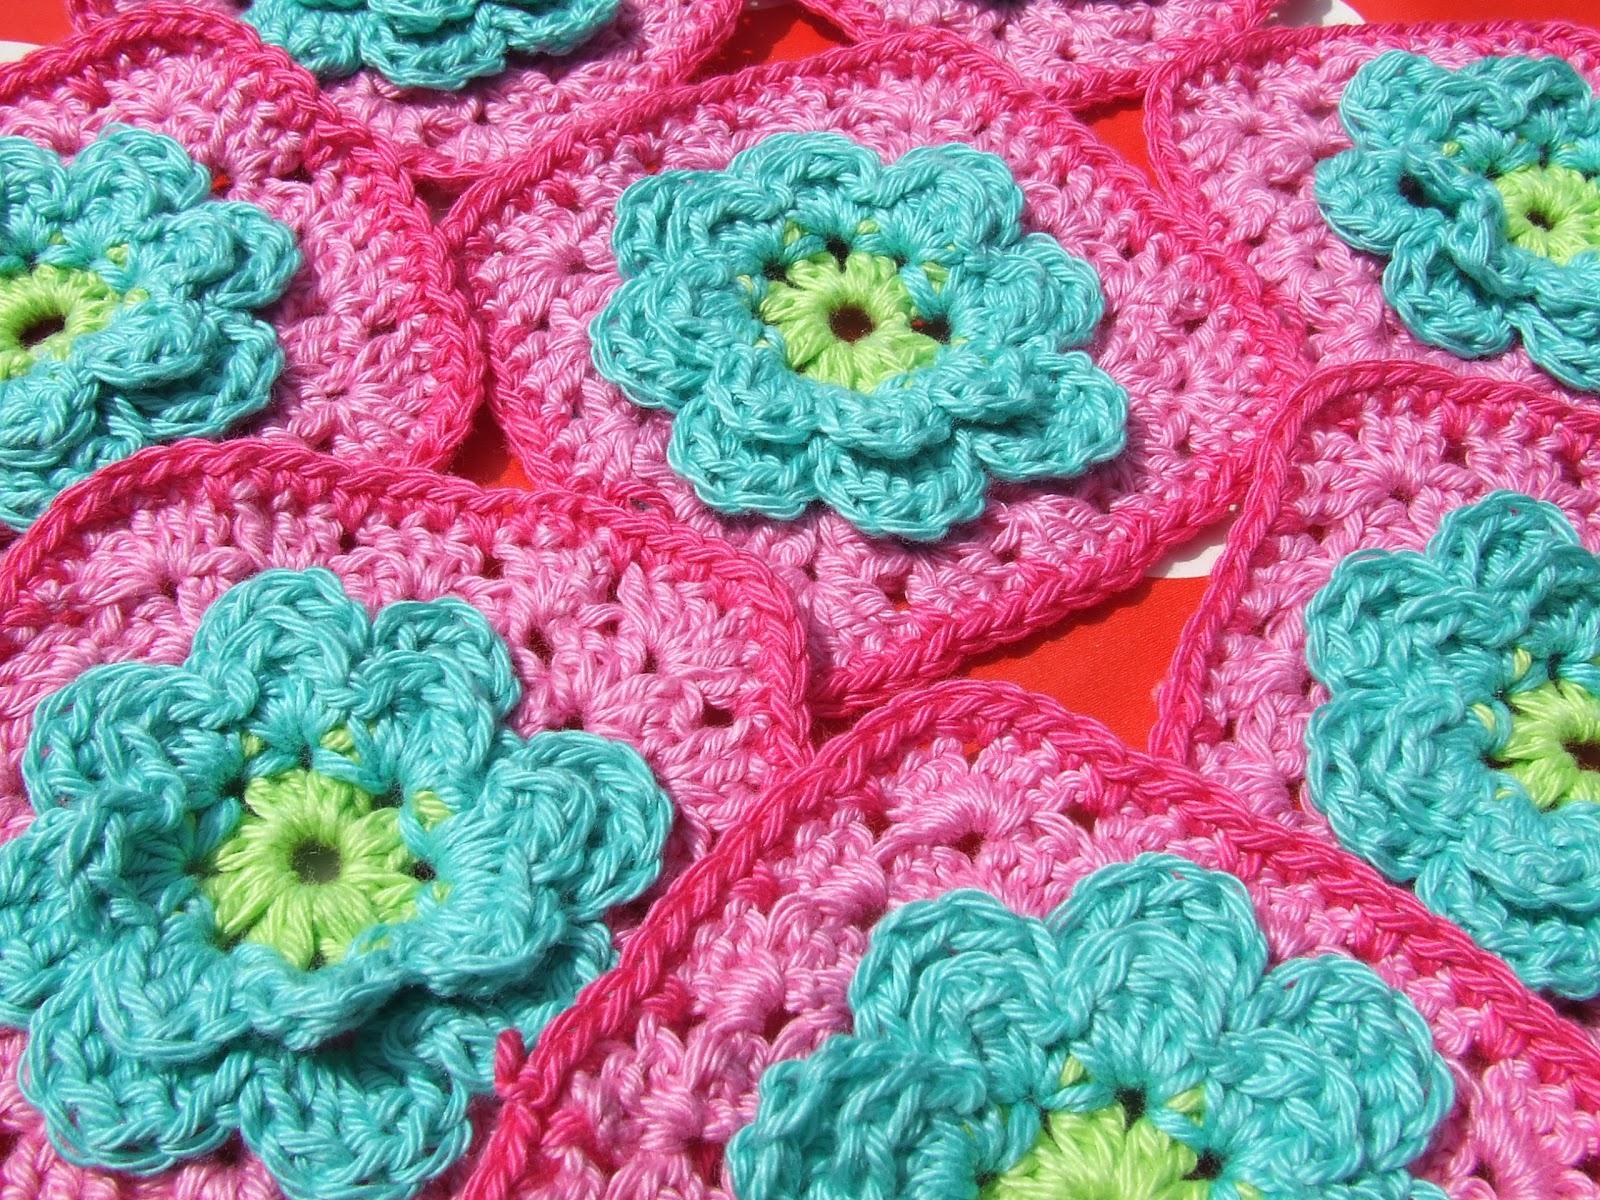 Petite Fee Patroon Bloem Granny Flower Granny